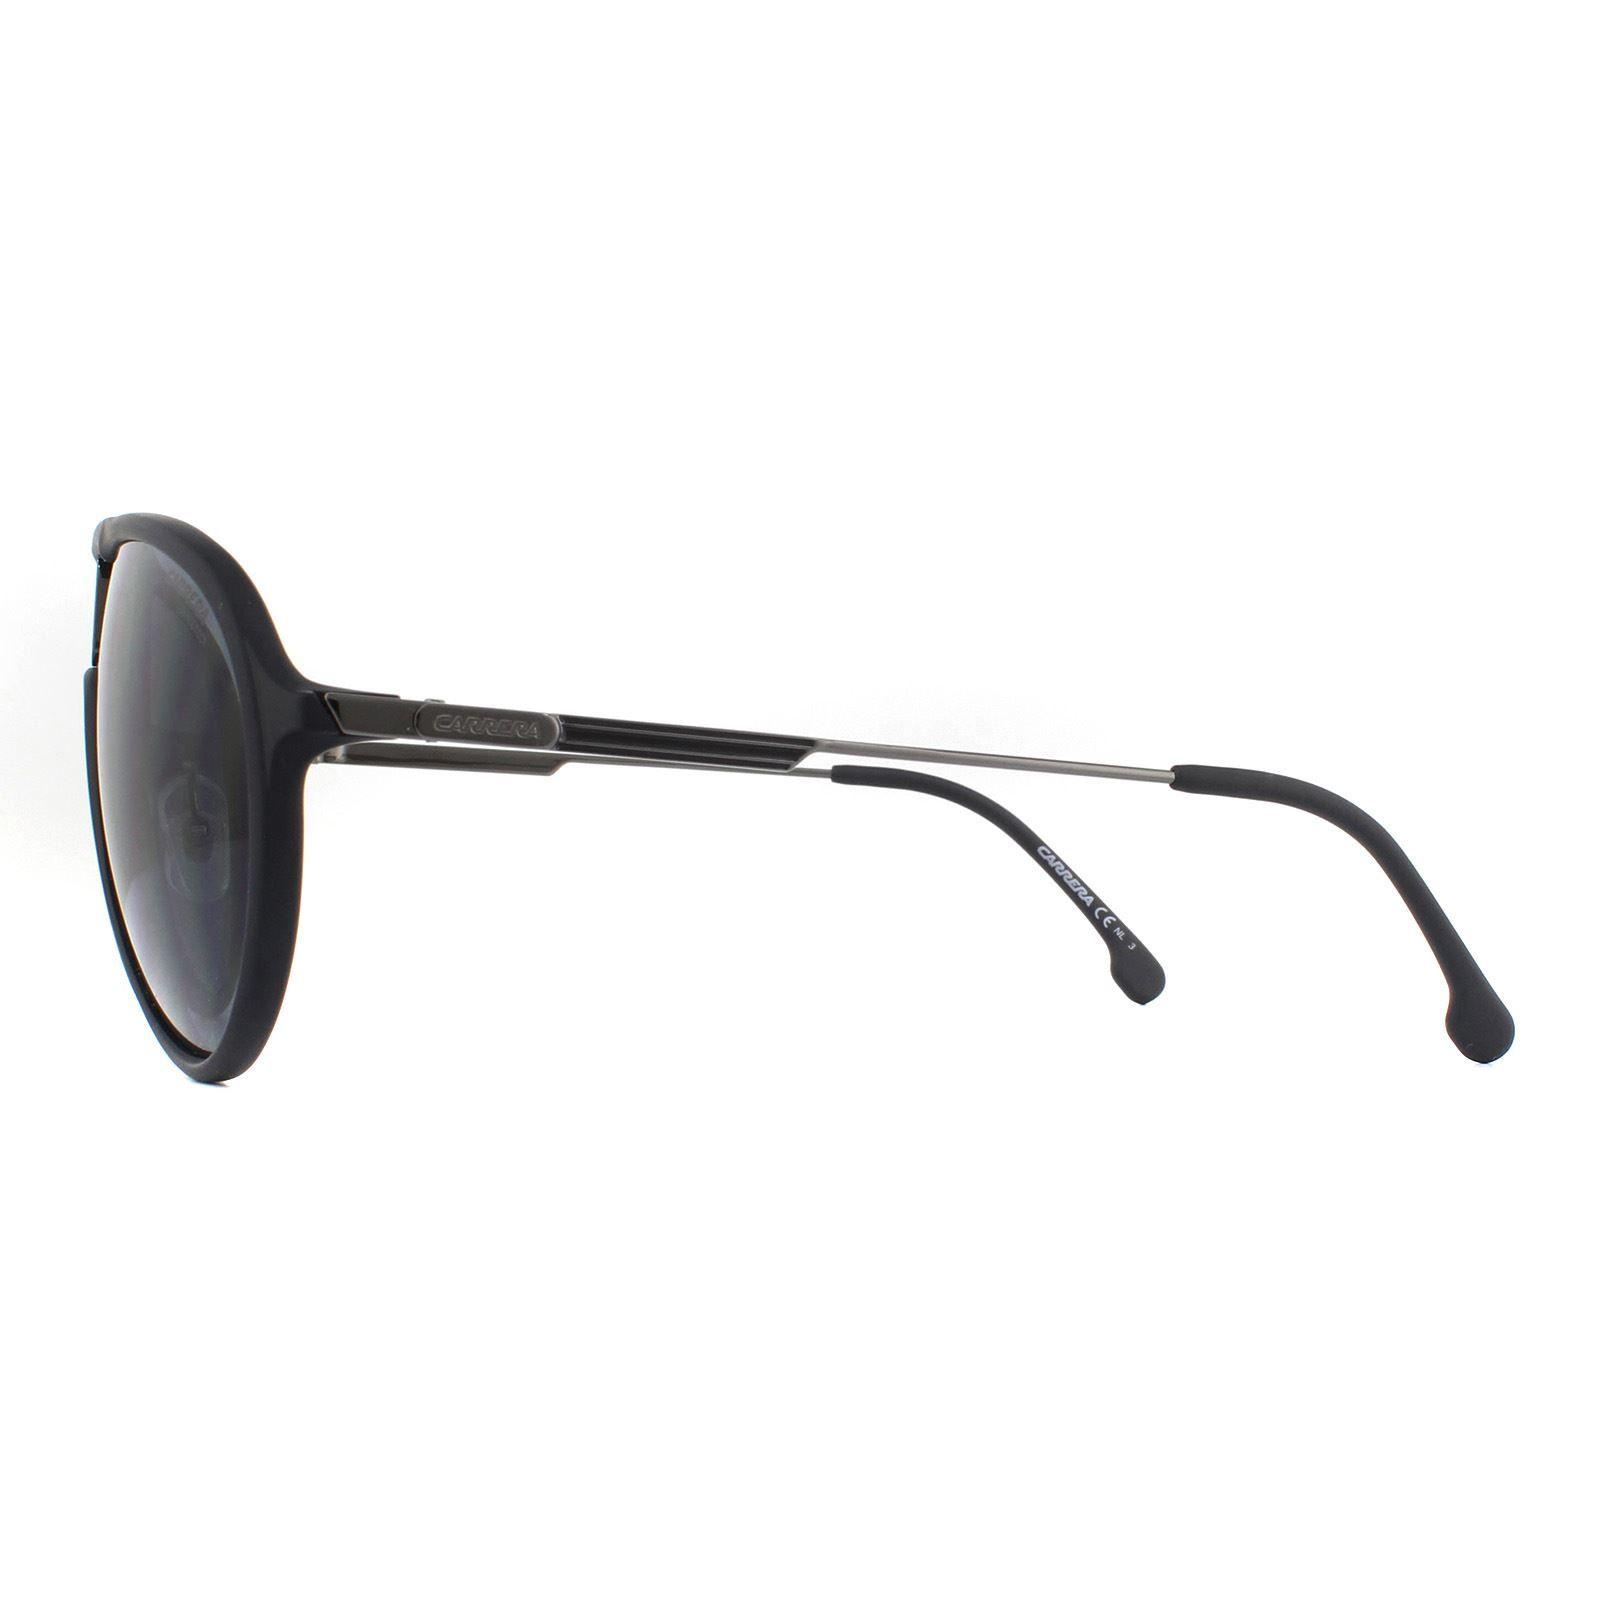 Carrera Sunglasses 1026/S 003 IR Matte Black Grey